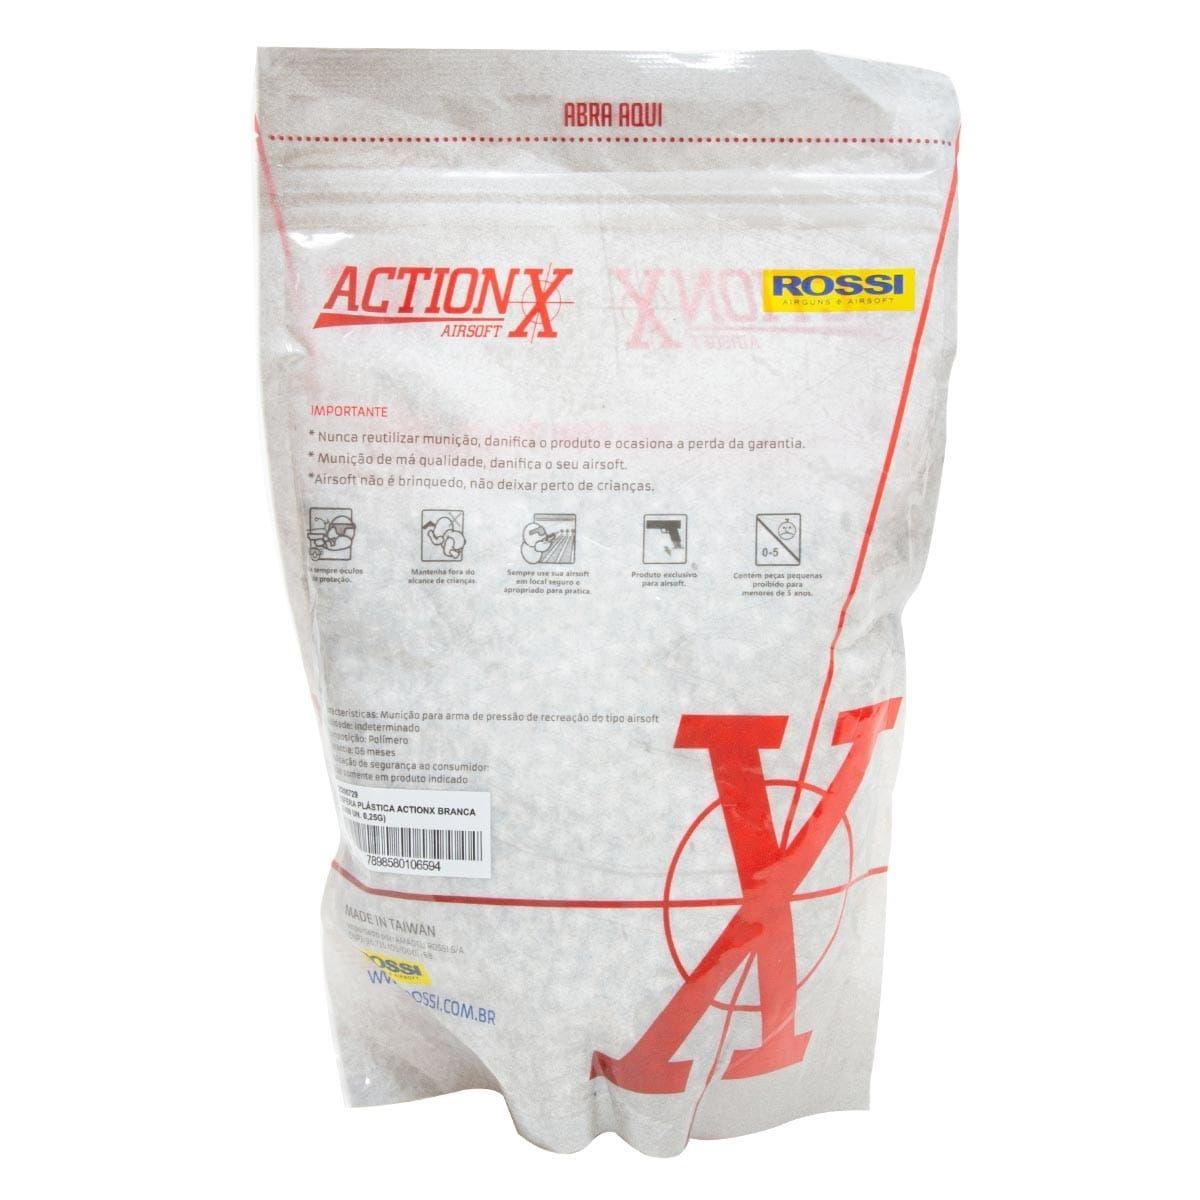 Esfera Plastica ActionX 0.25g Branca (4000un) 6mm